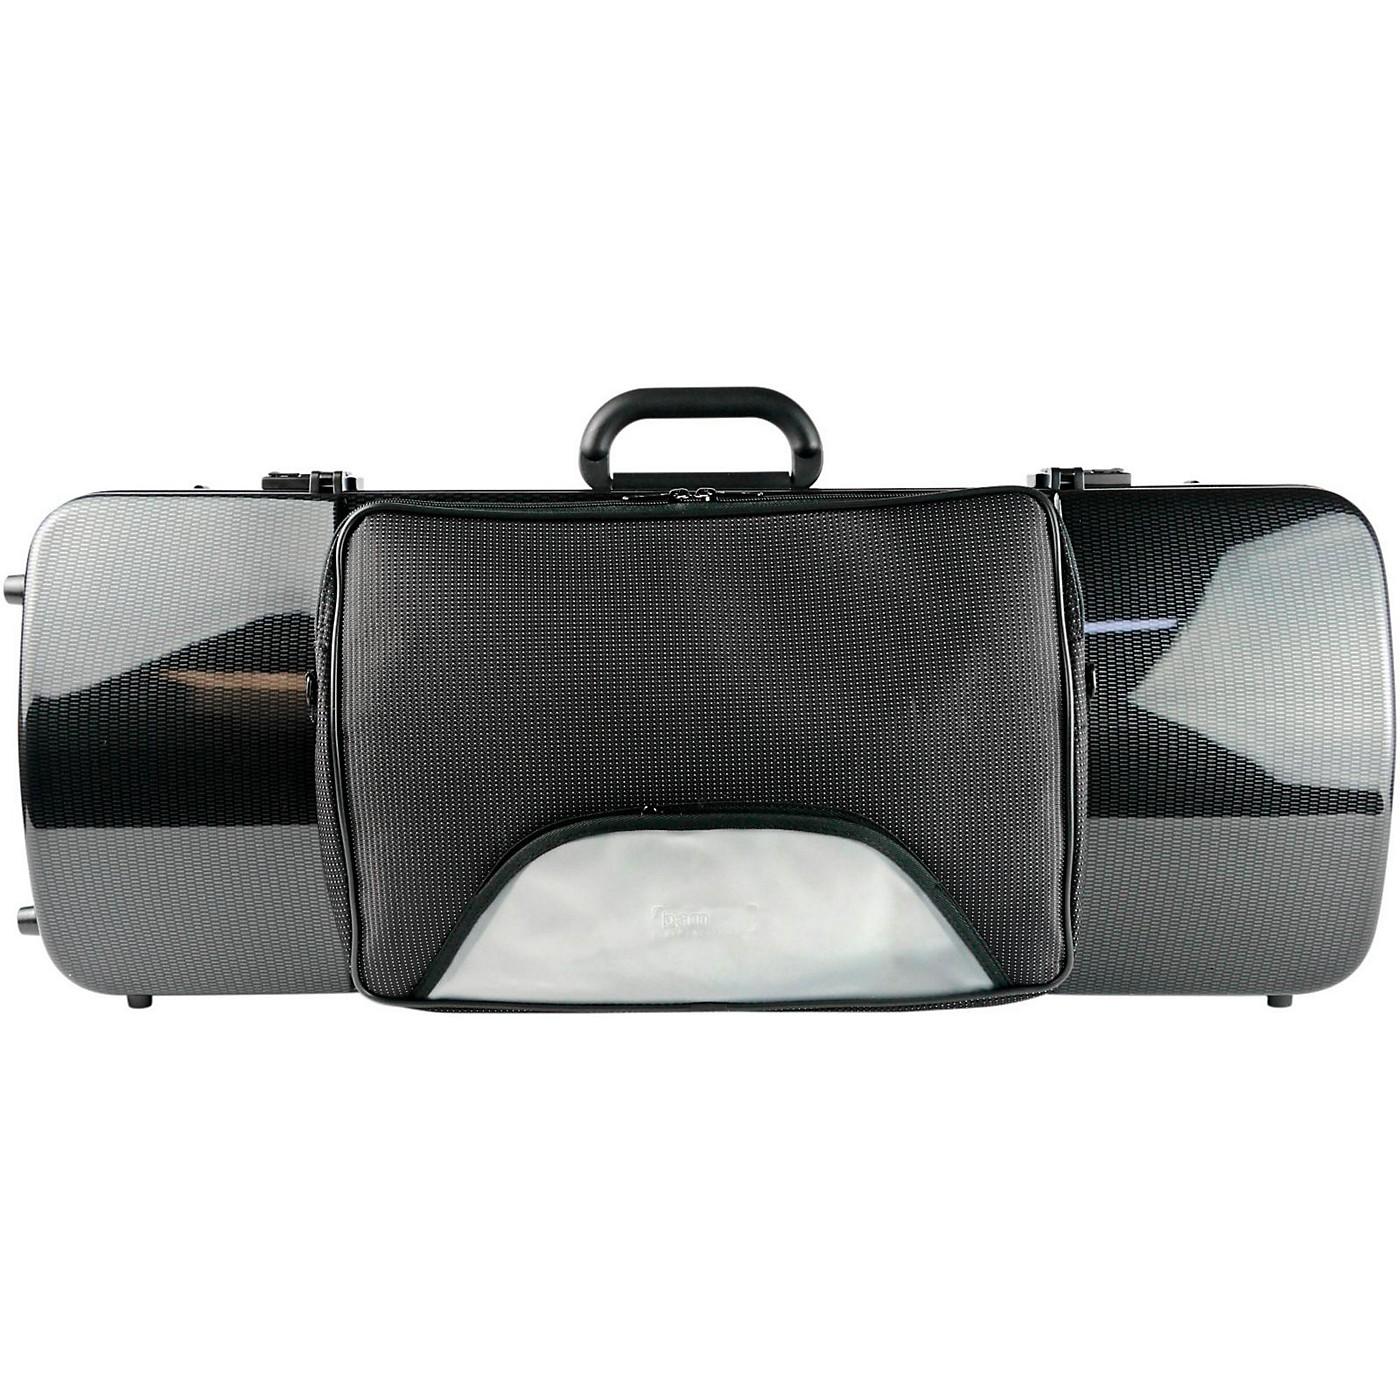 Bam 2202XL Hightech Large Adjustable Viola Case with Pocket thumbnail